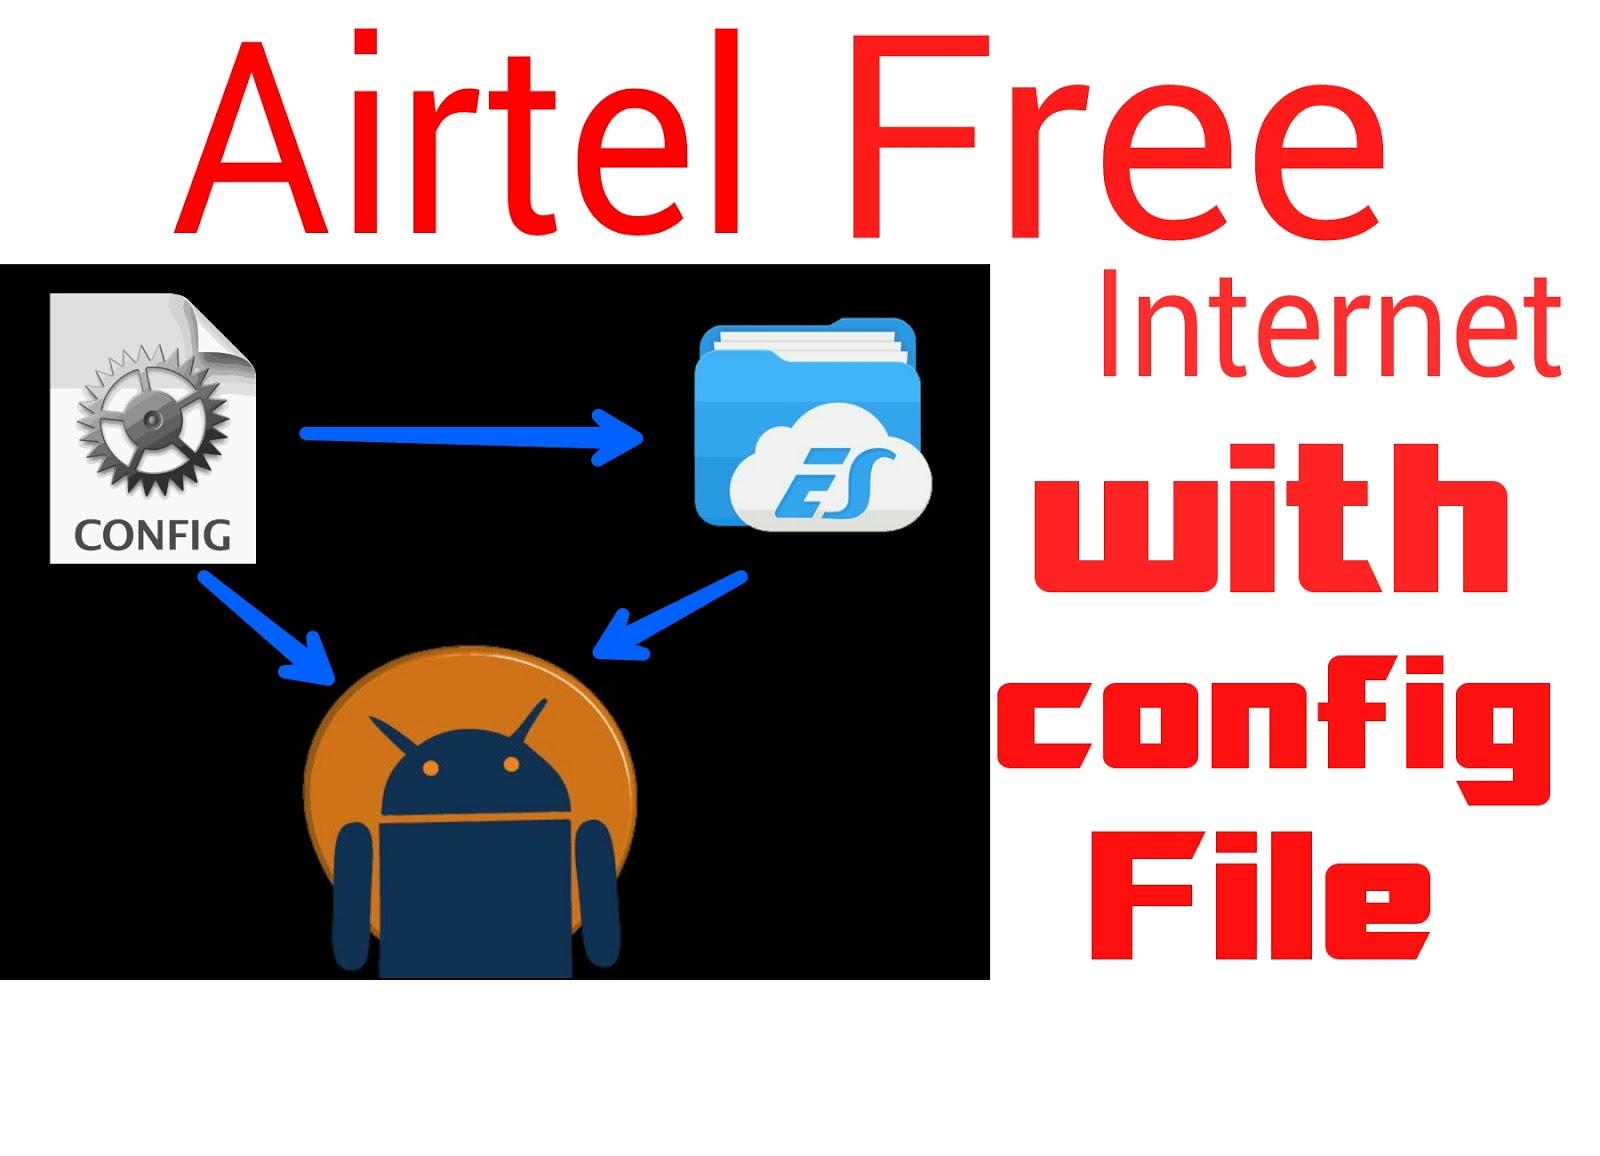 Android phone me free internet kaise chalate hai Open vpn ki